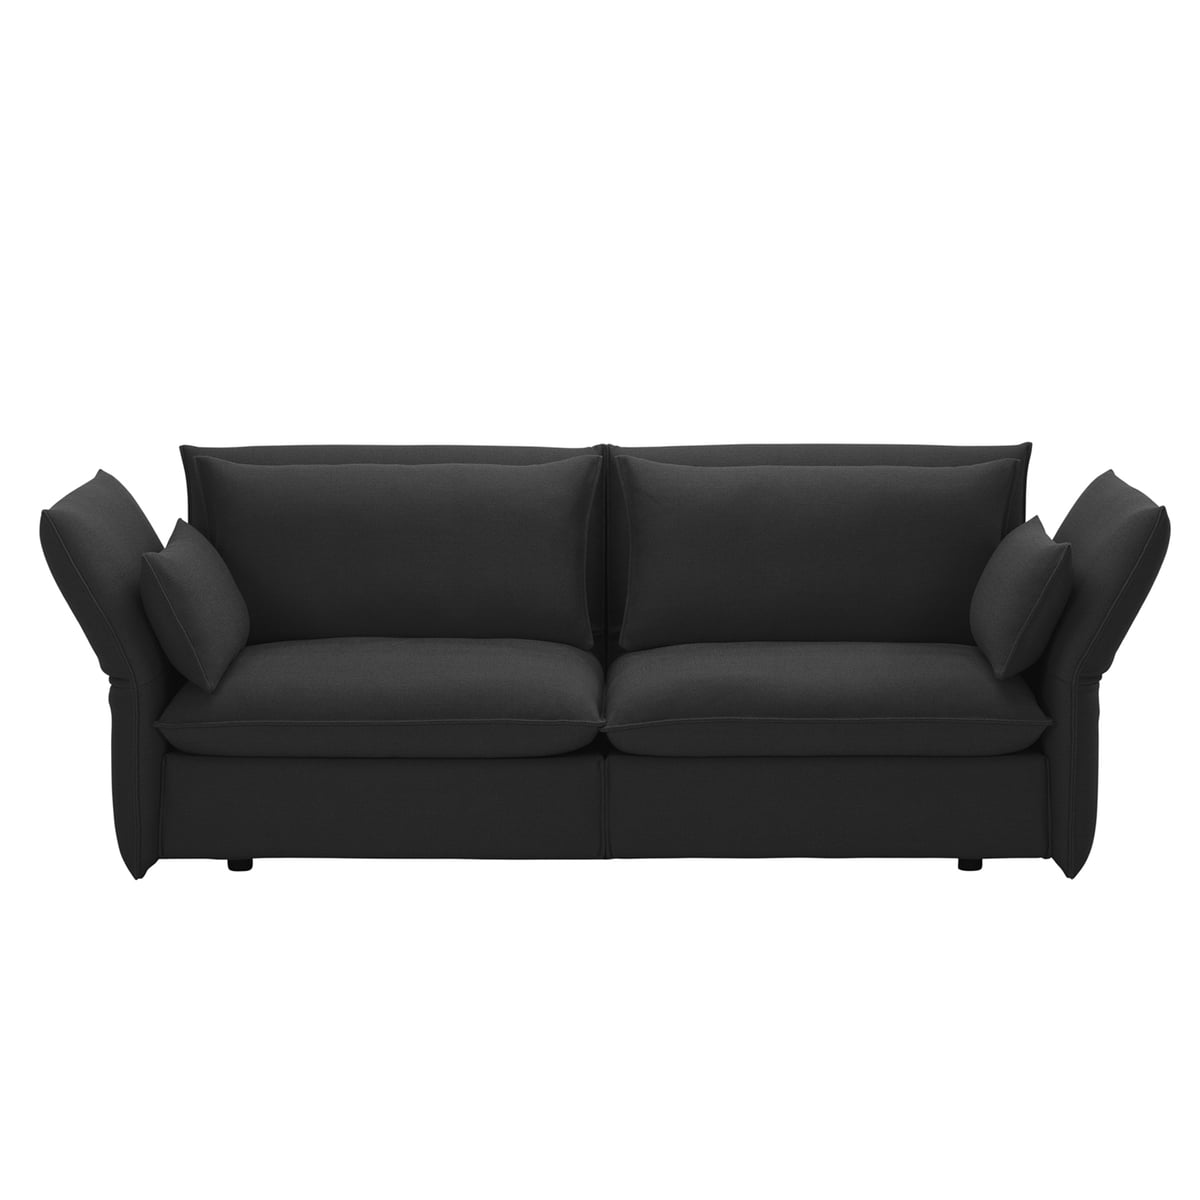 f08e331c0e4e0c Vitra - Mariposa Sofa 2.5-Sitzer